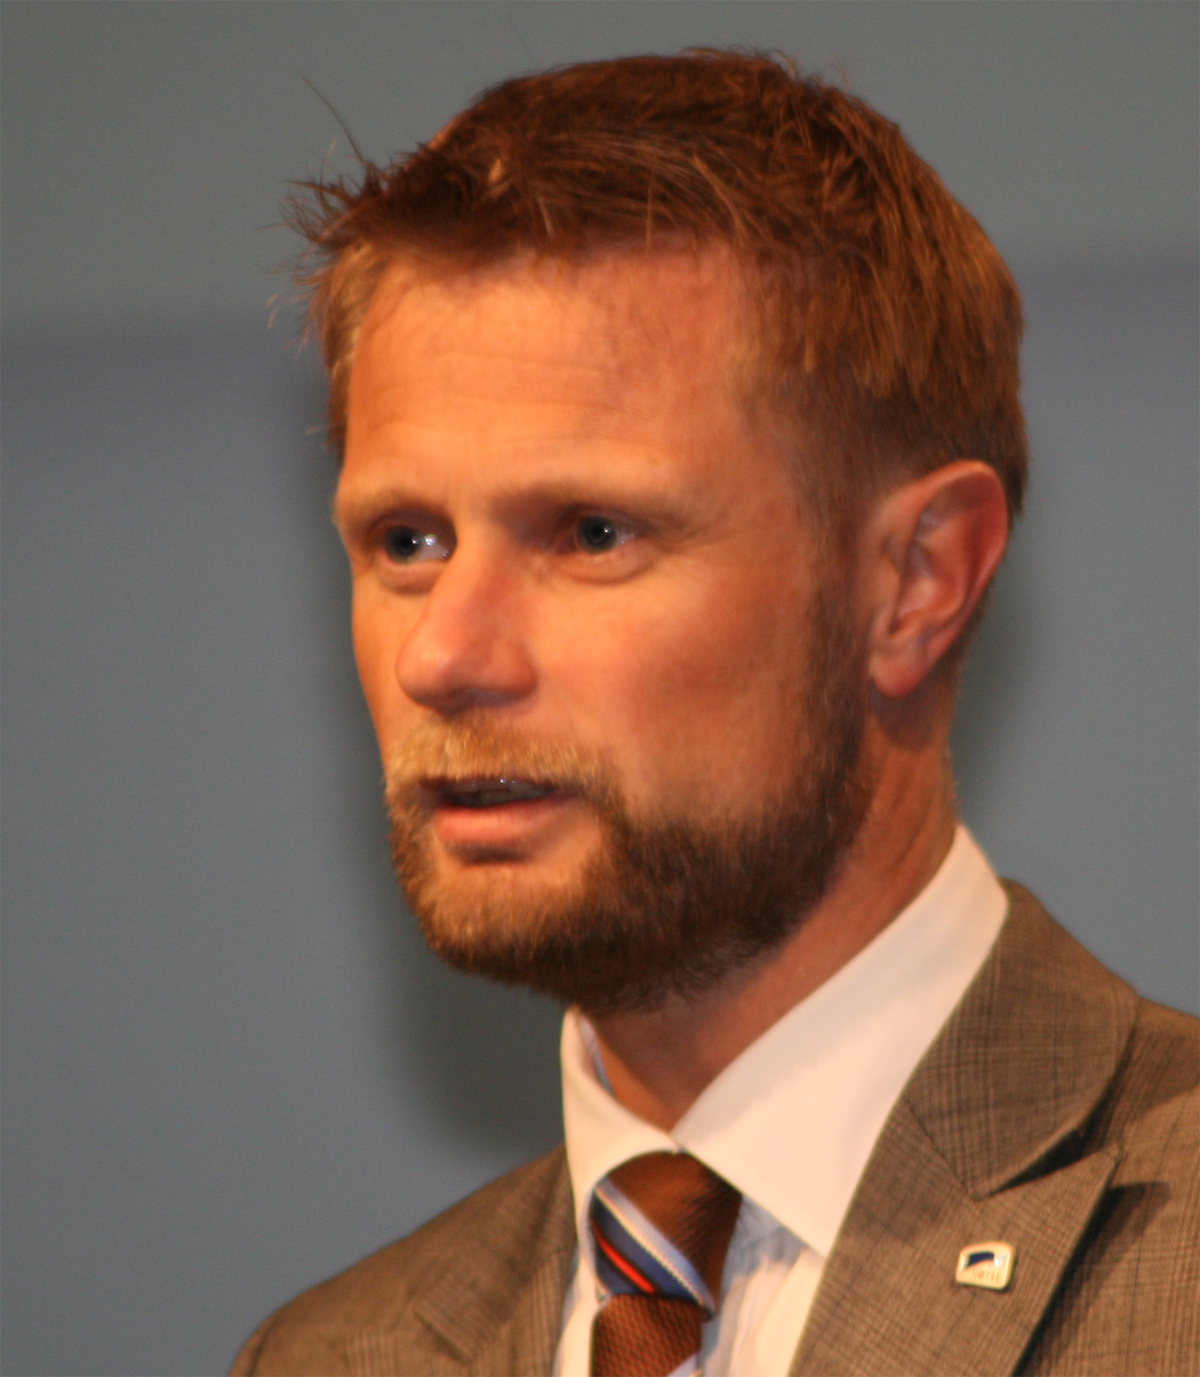 Bent Hoie Wikipedia